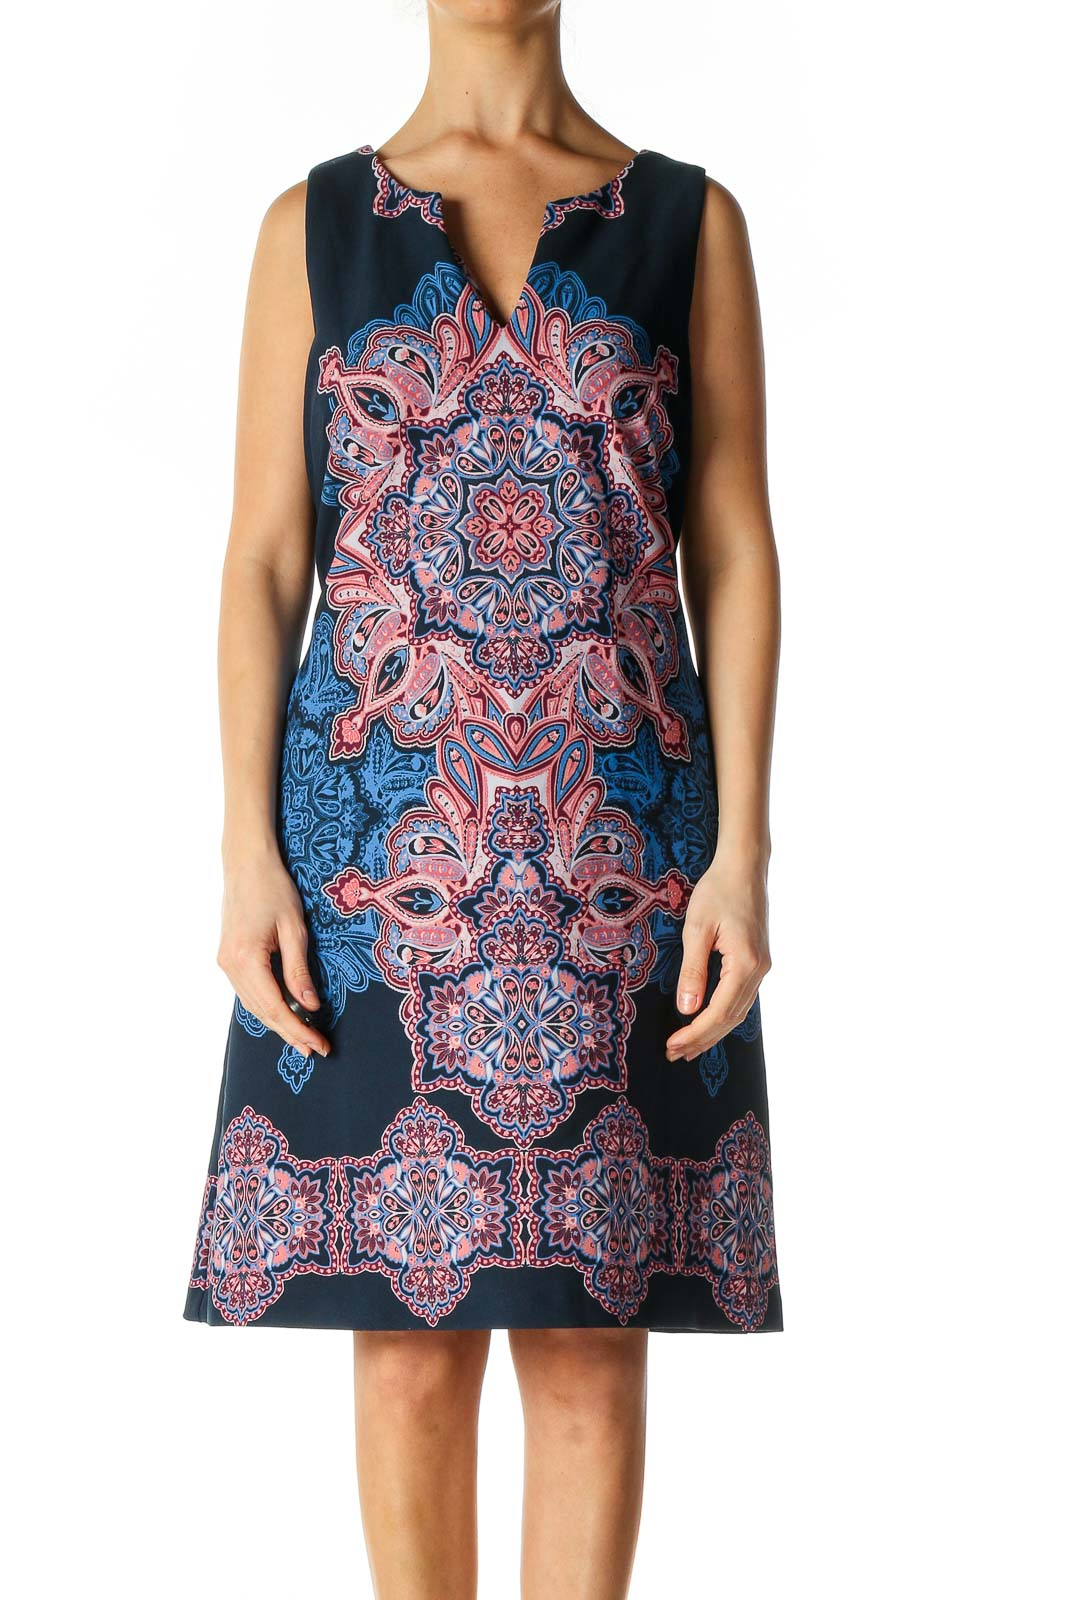 Blue Geometric Print Bohemian A-Line Dress Front